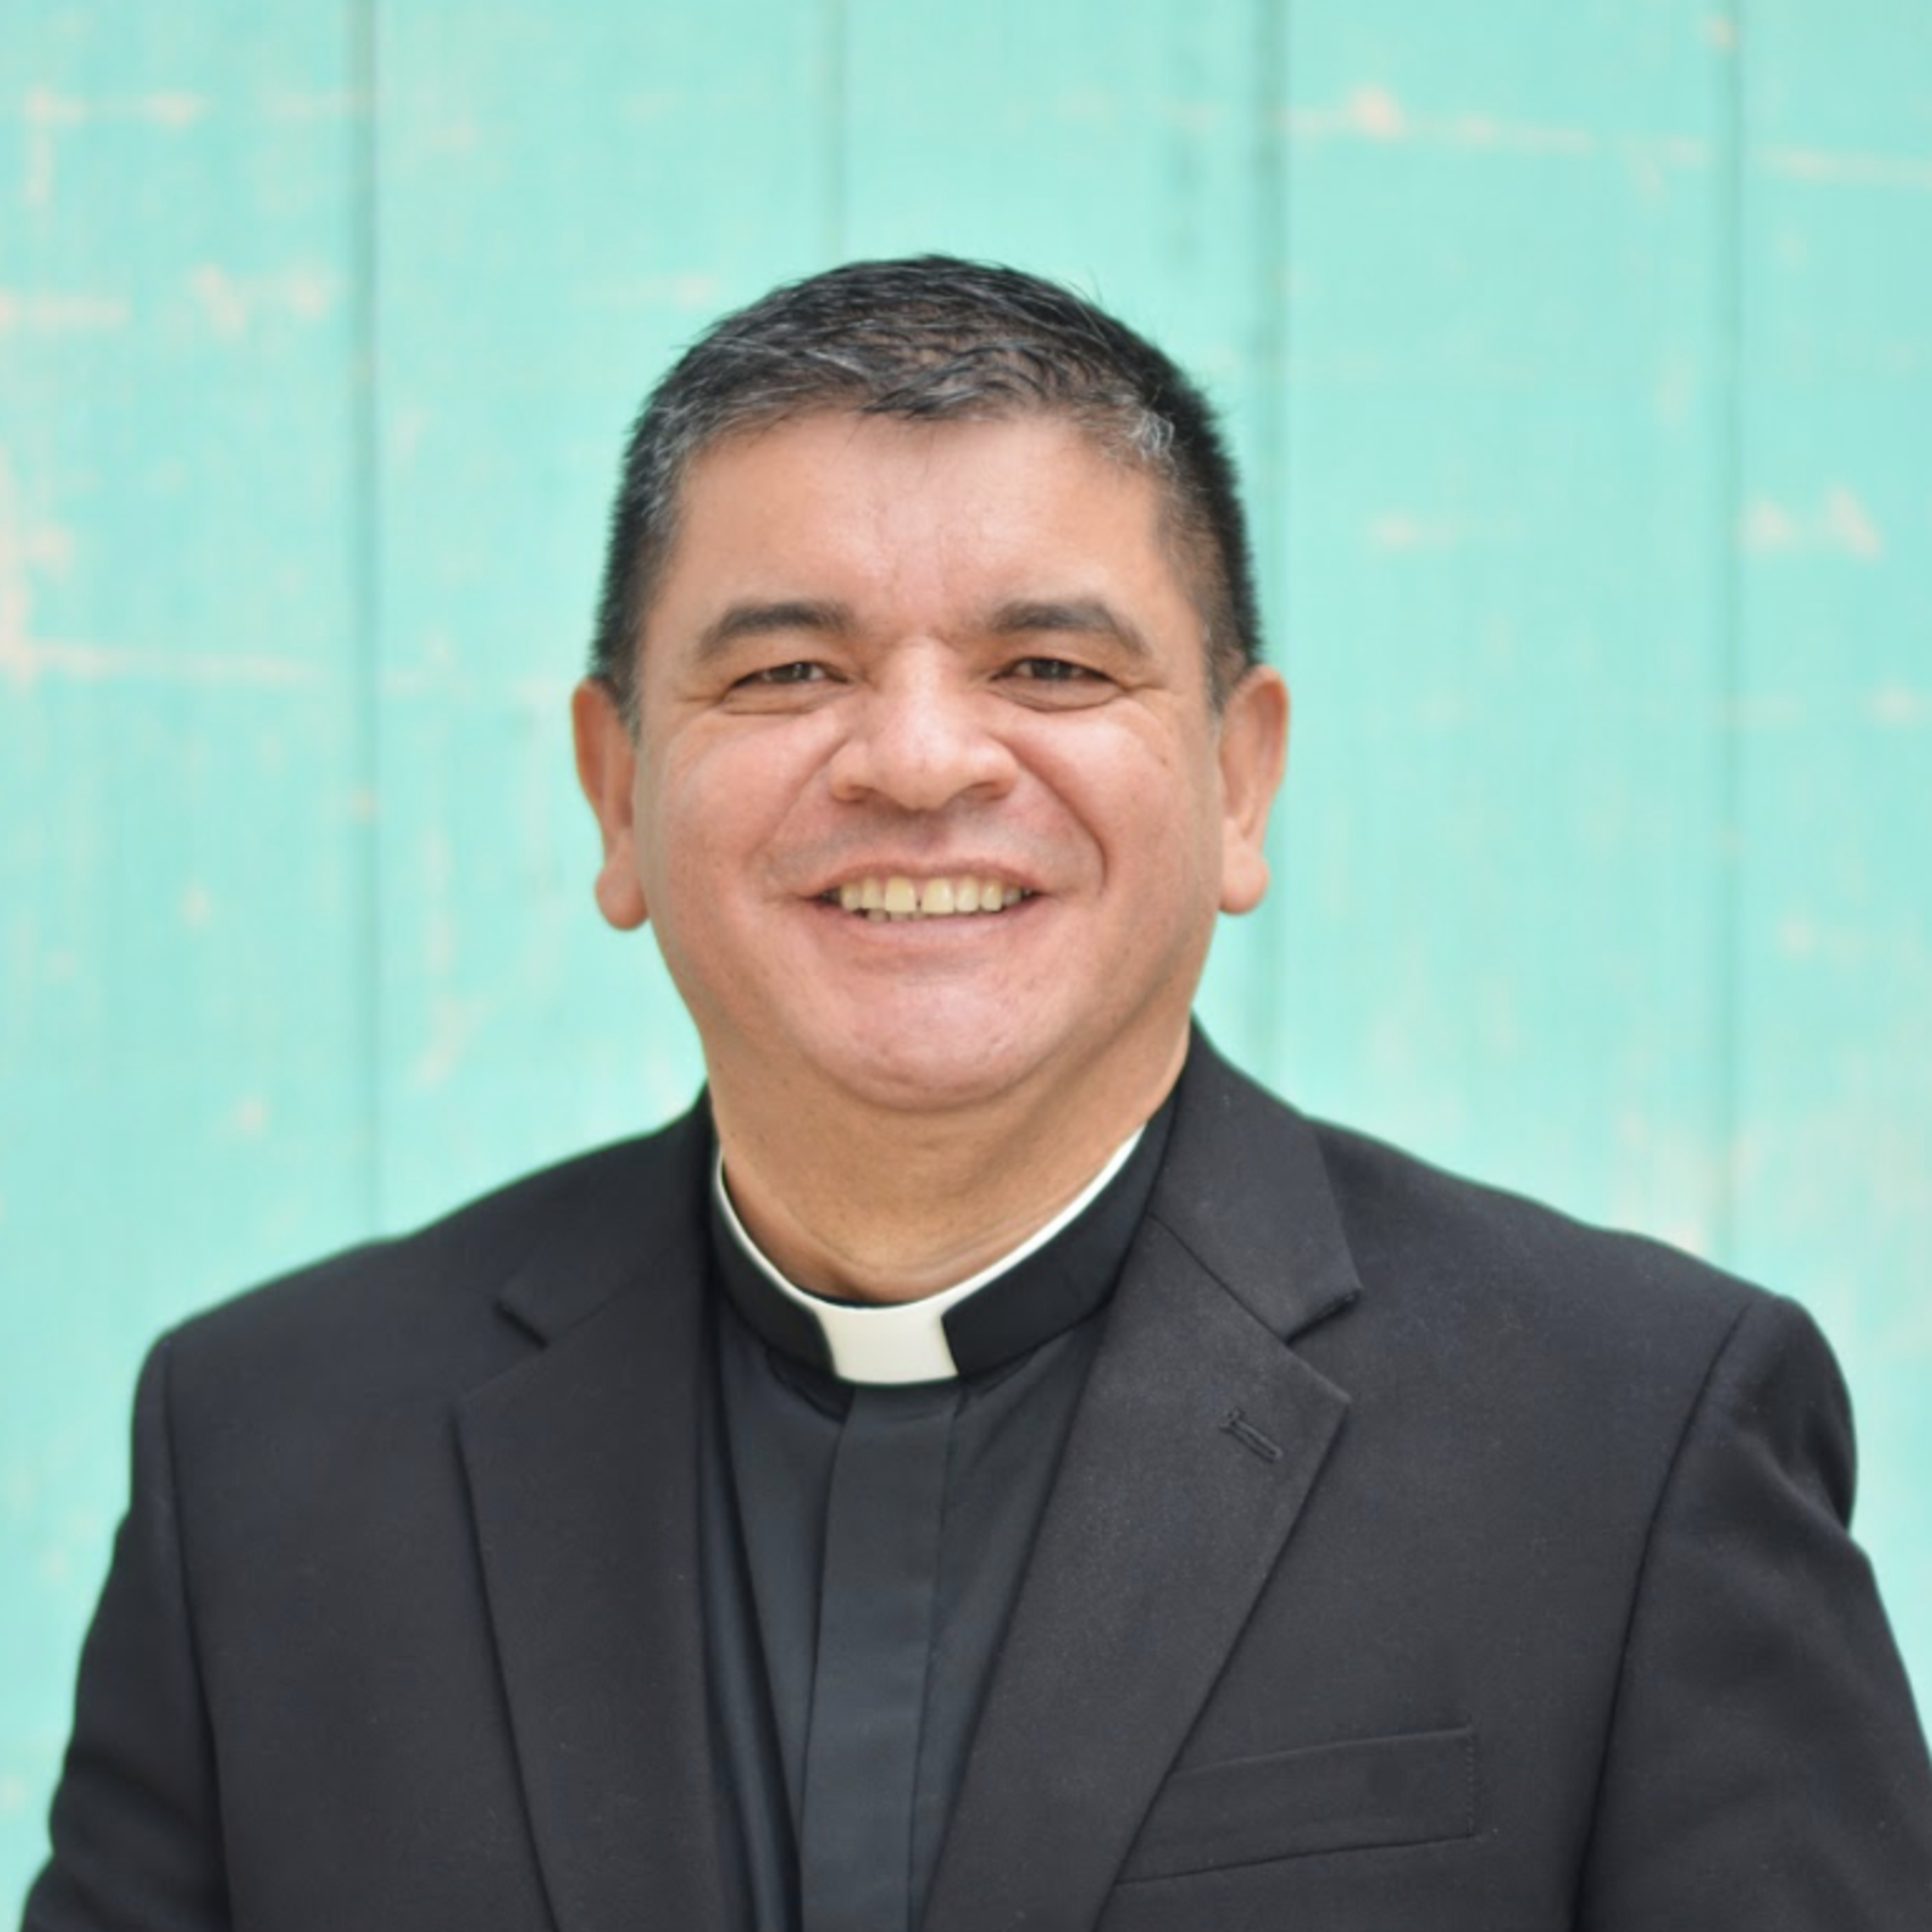 Fr. Oscar Borda